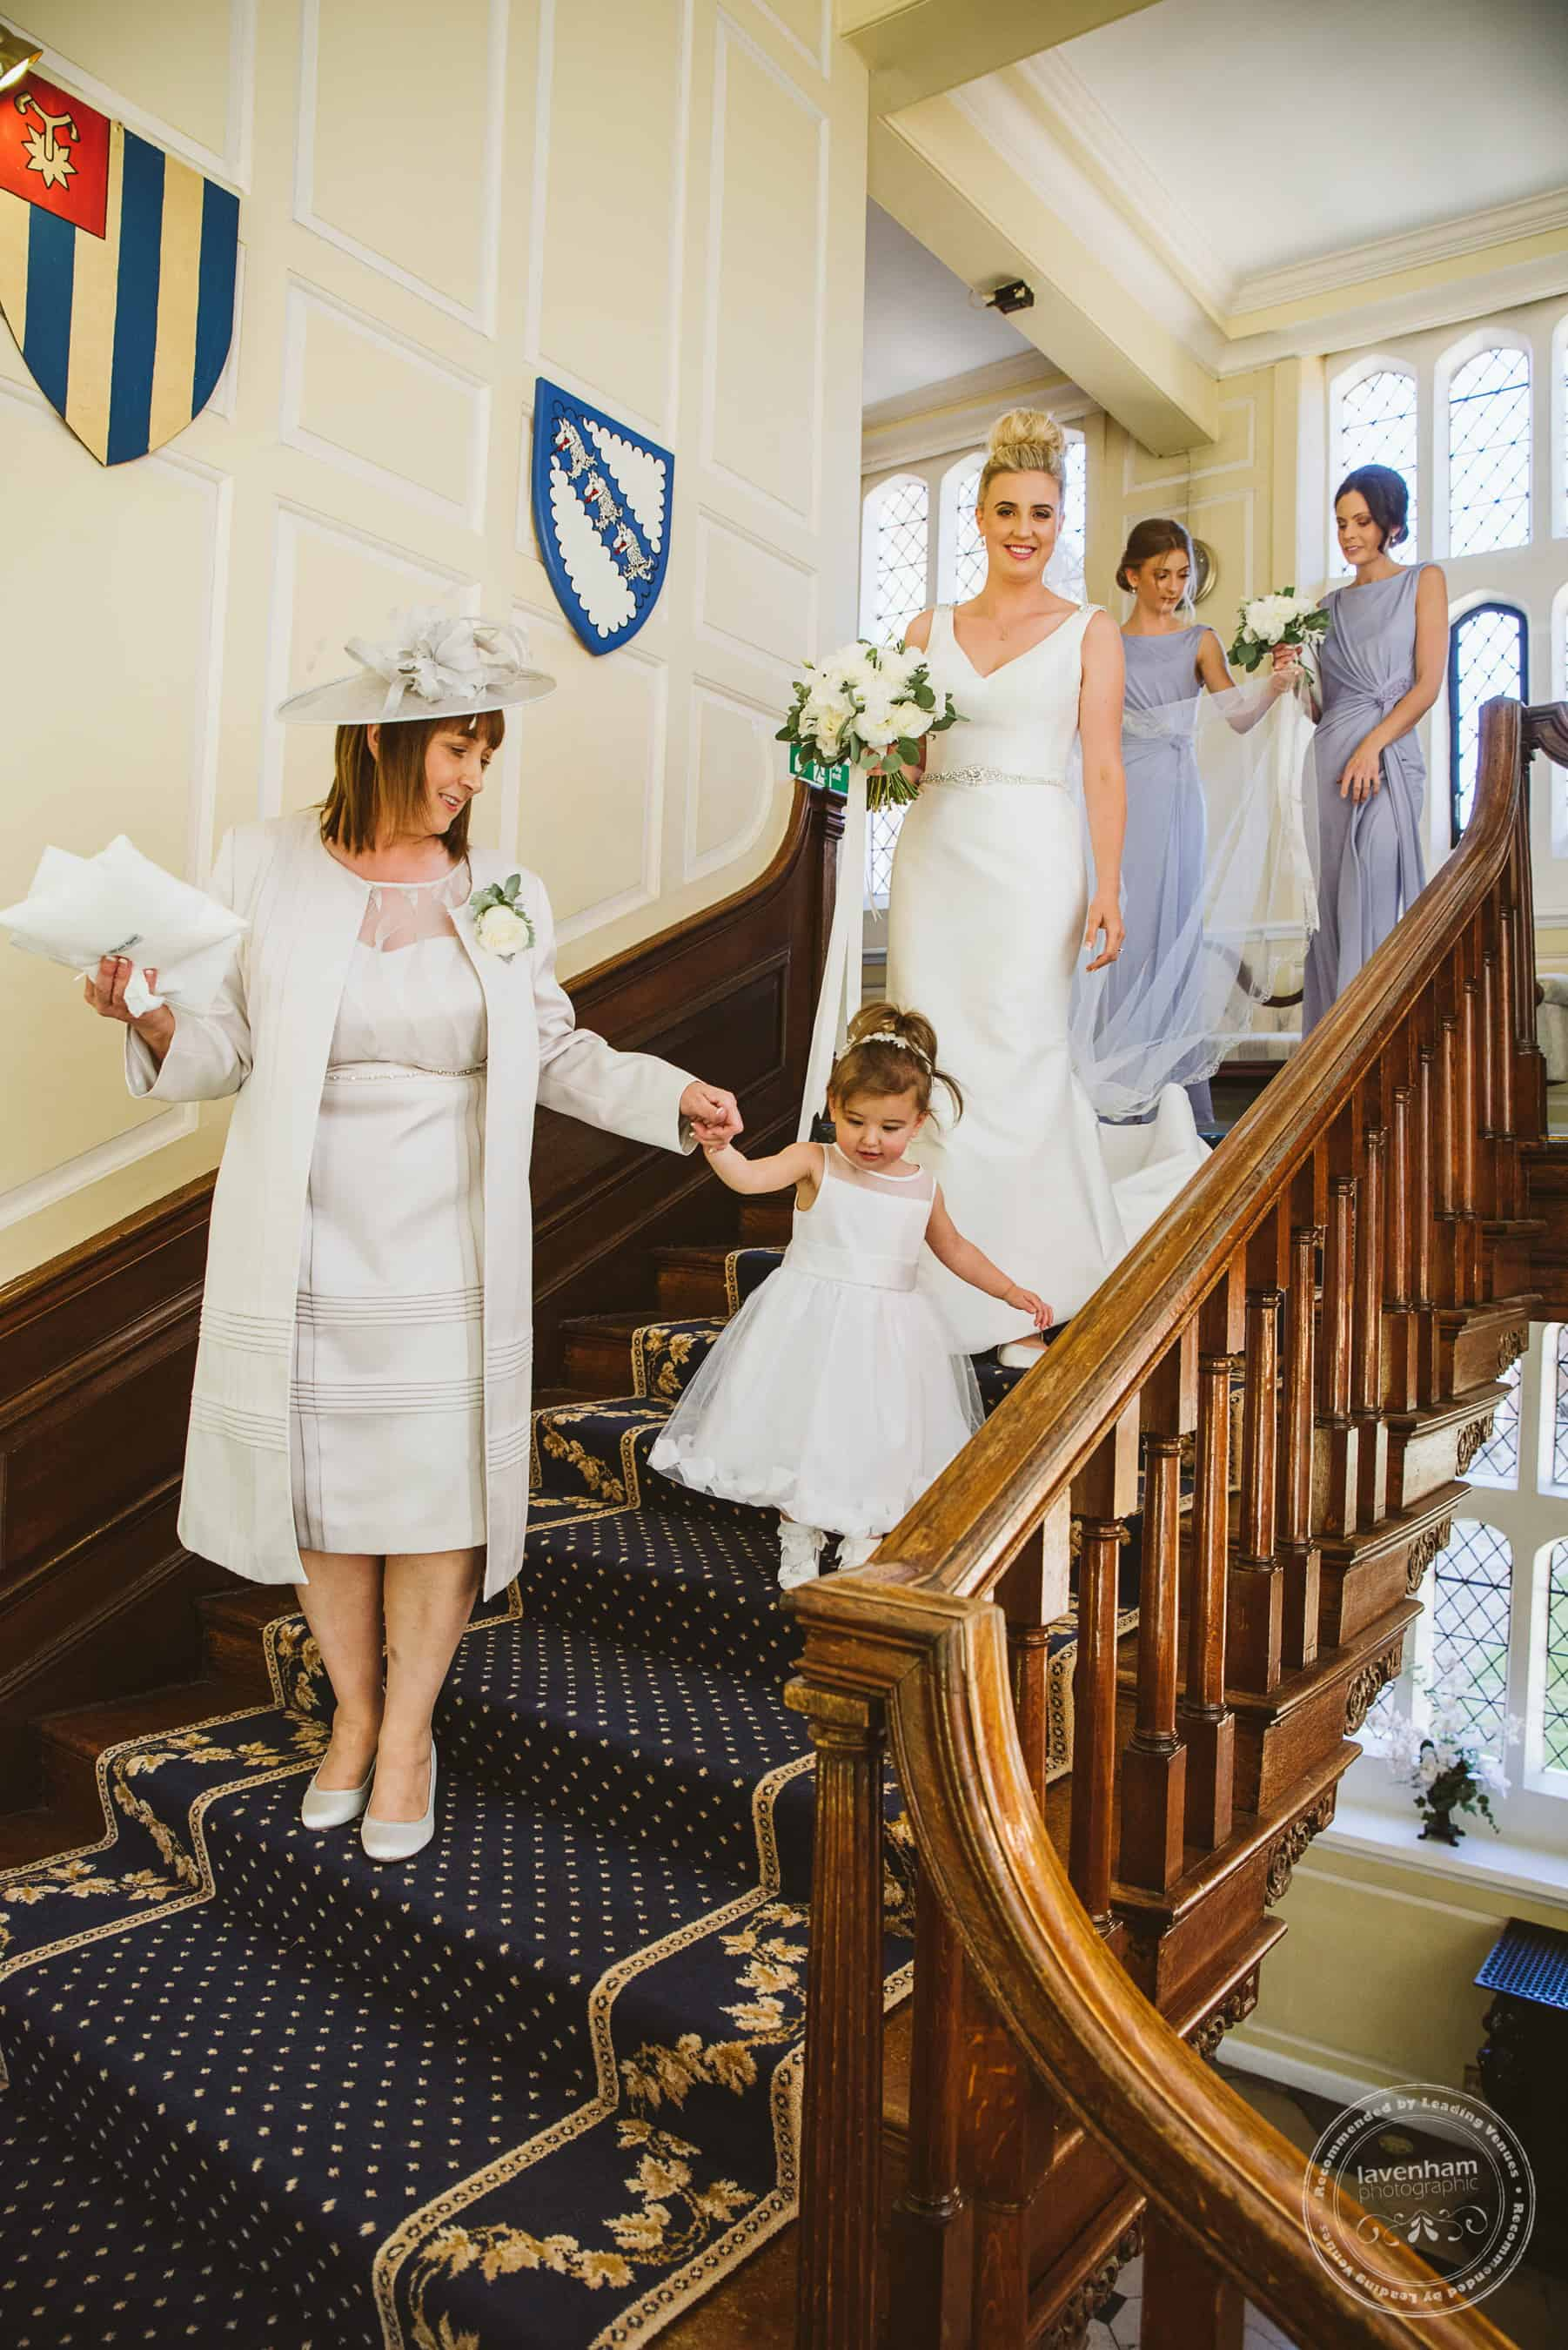 220618 Gosfield Hall Wedding Photography Lavenham Photographic 0063